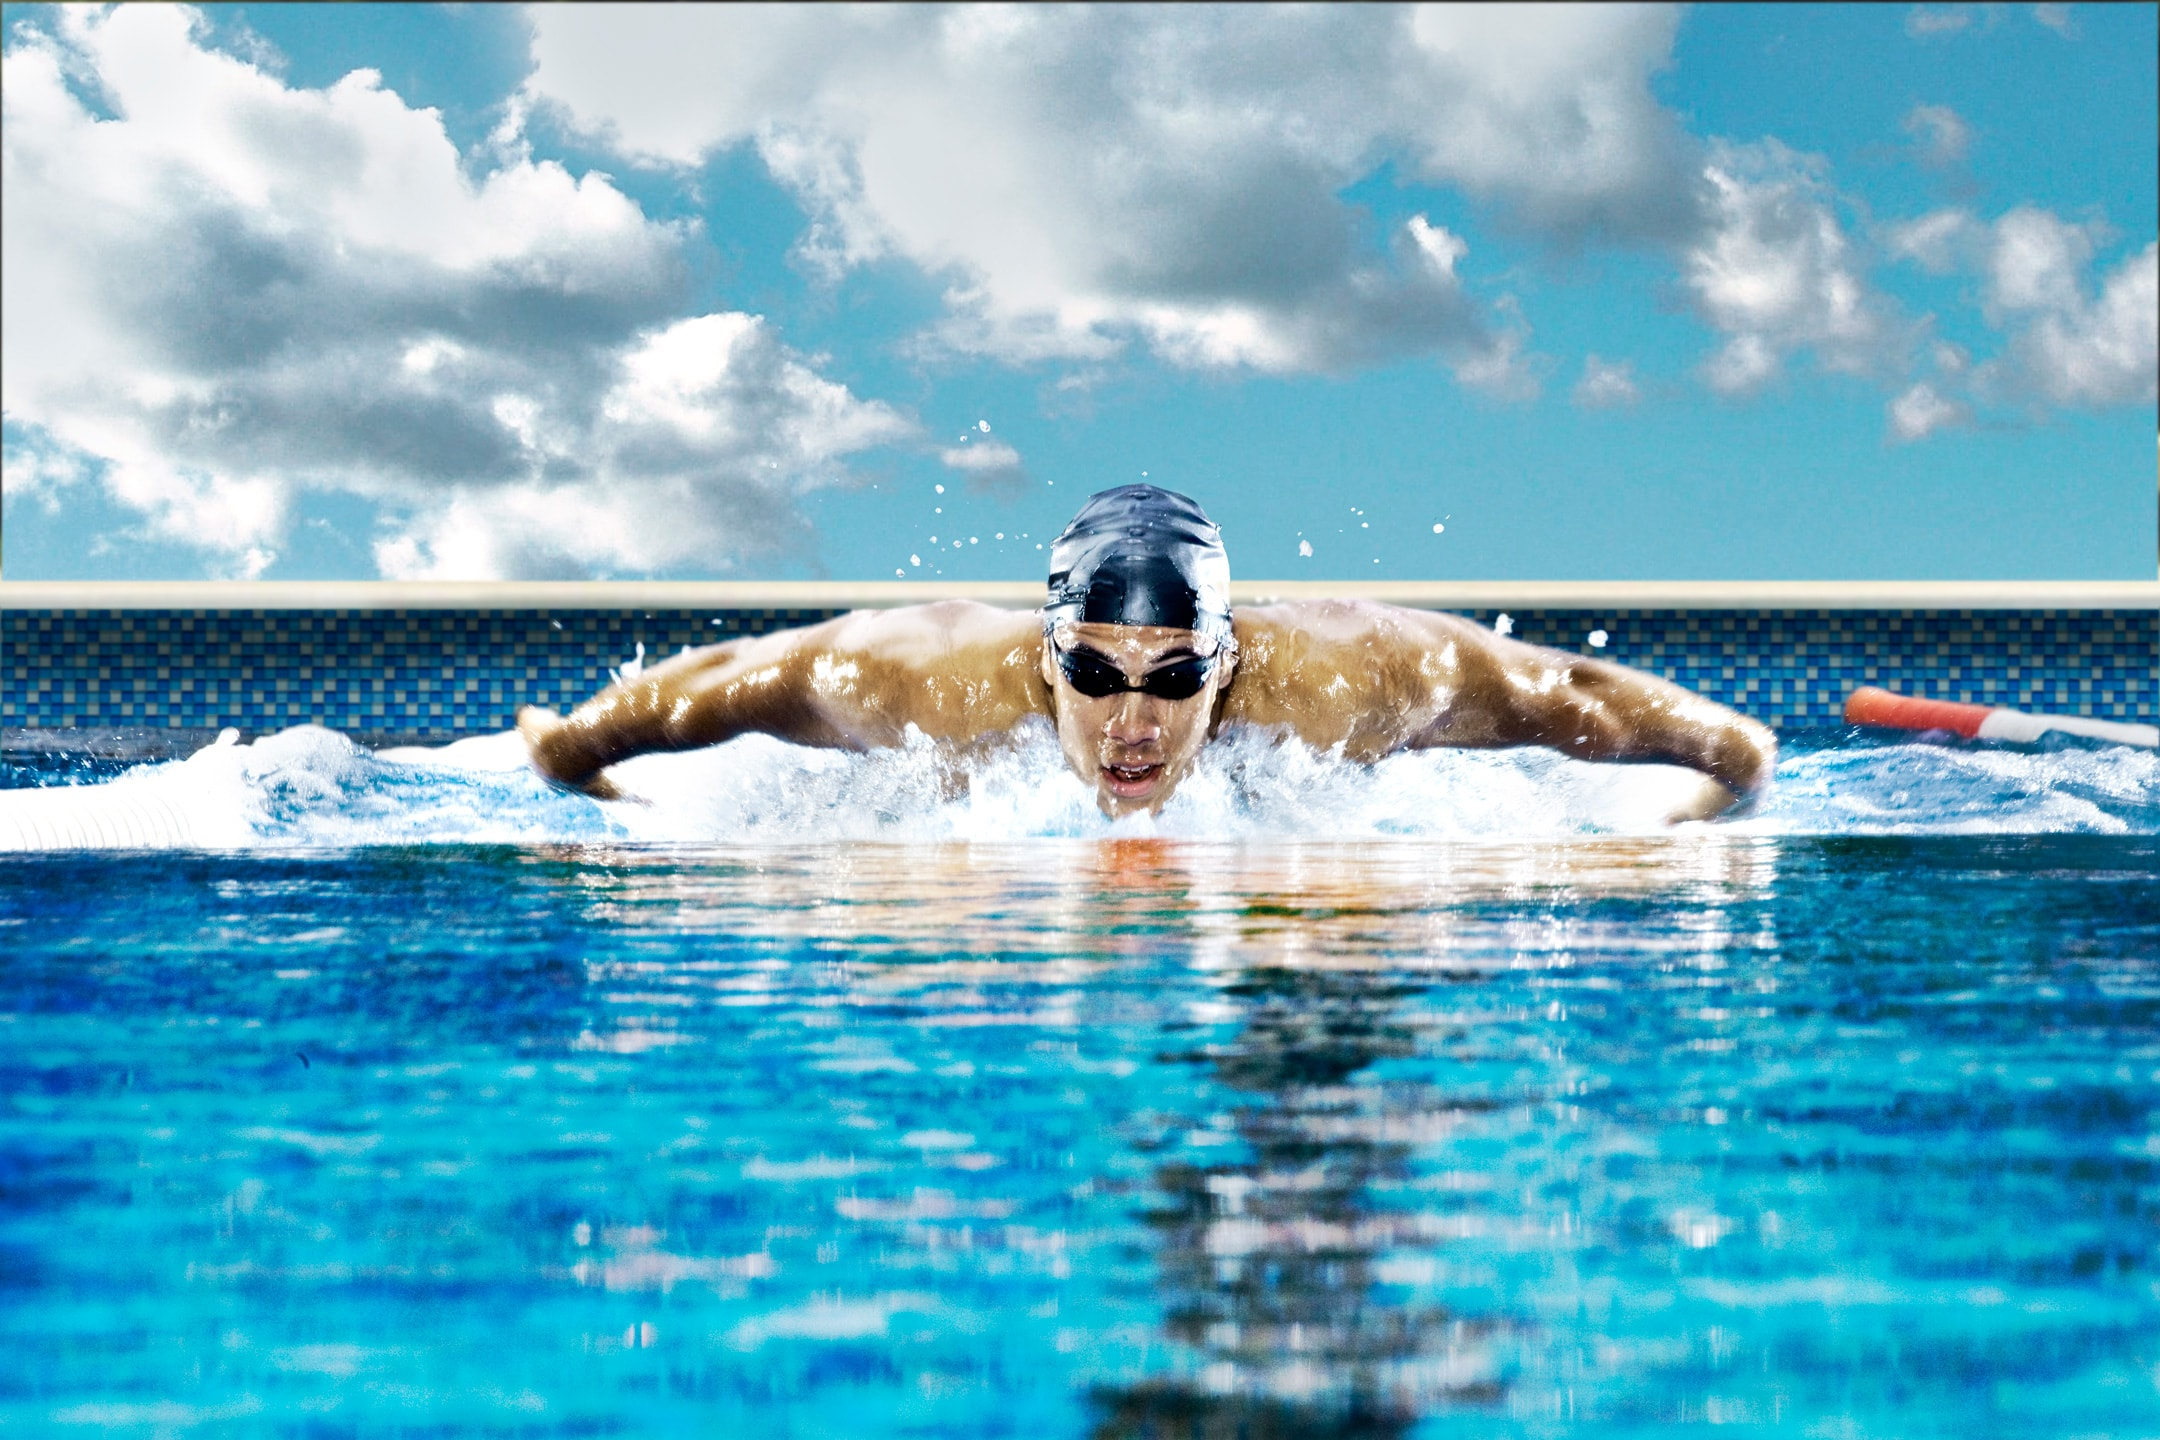 water-sports-photography-miami-marcel-boldu.jpg